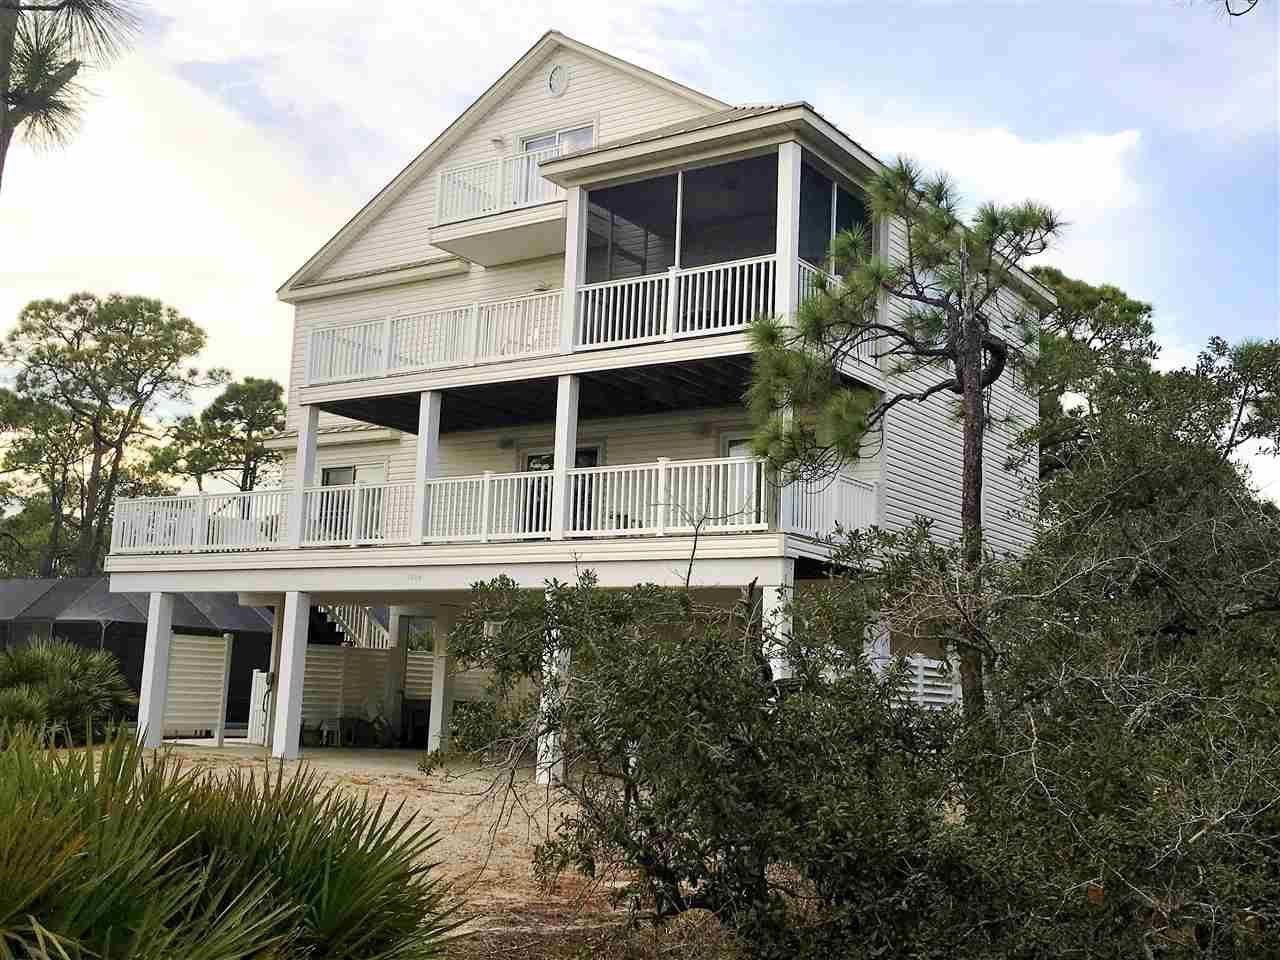 1604 ivy Way, Eastpoint, FL 32328 - MLS#: 336558